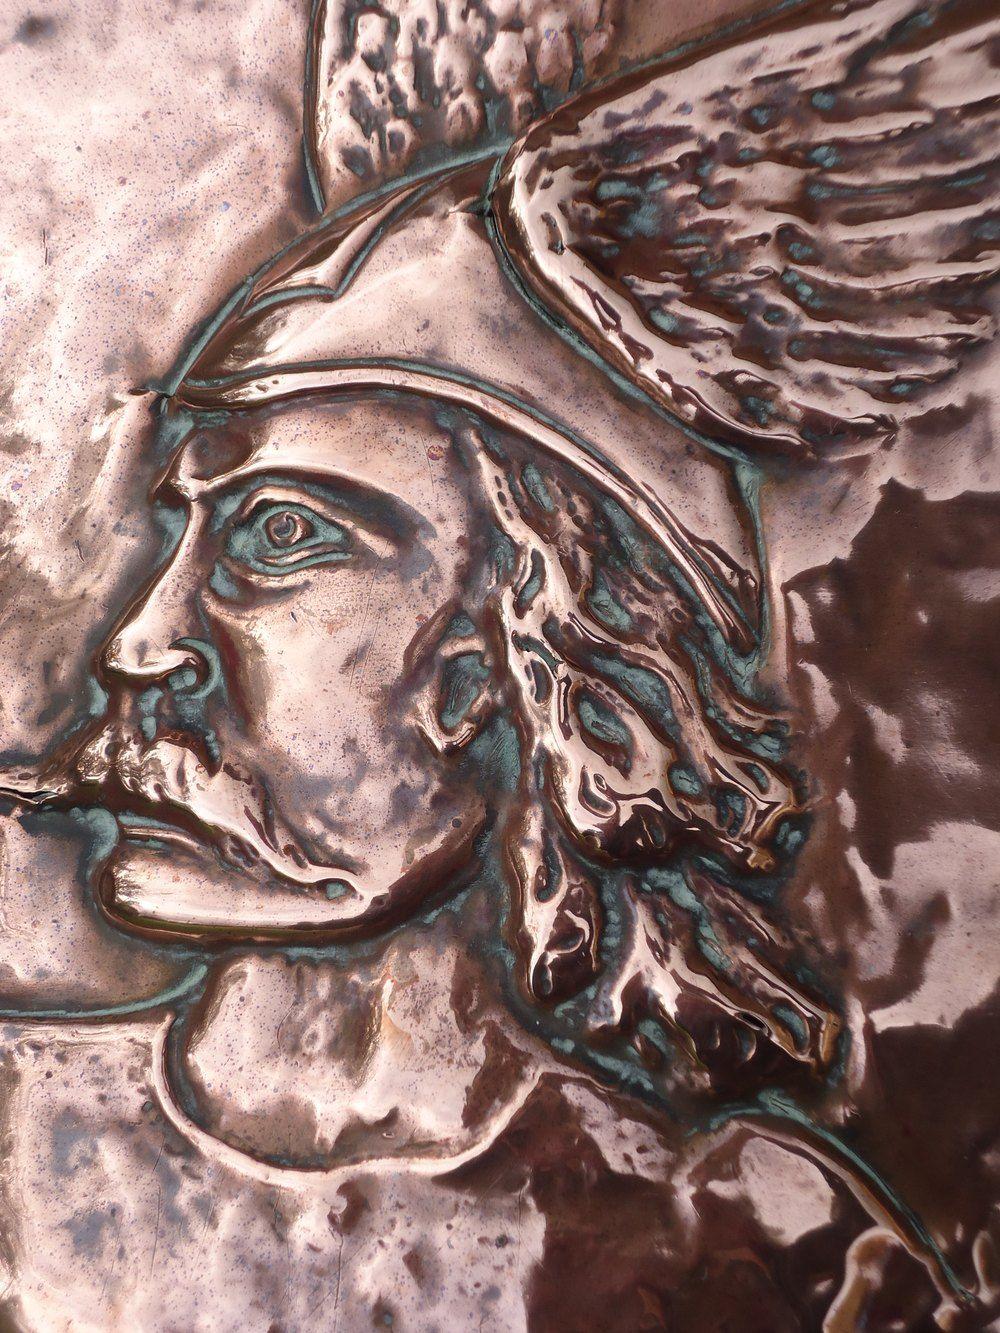 Antiques Atlas - Stunning Arts & Crafts Coal Bin With Warrior